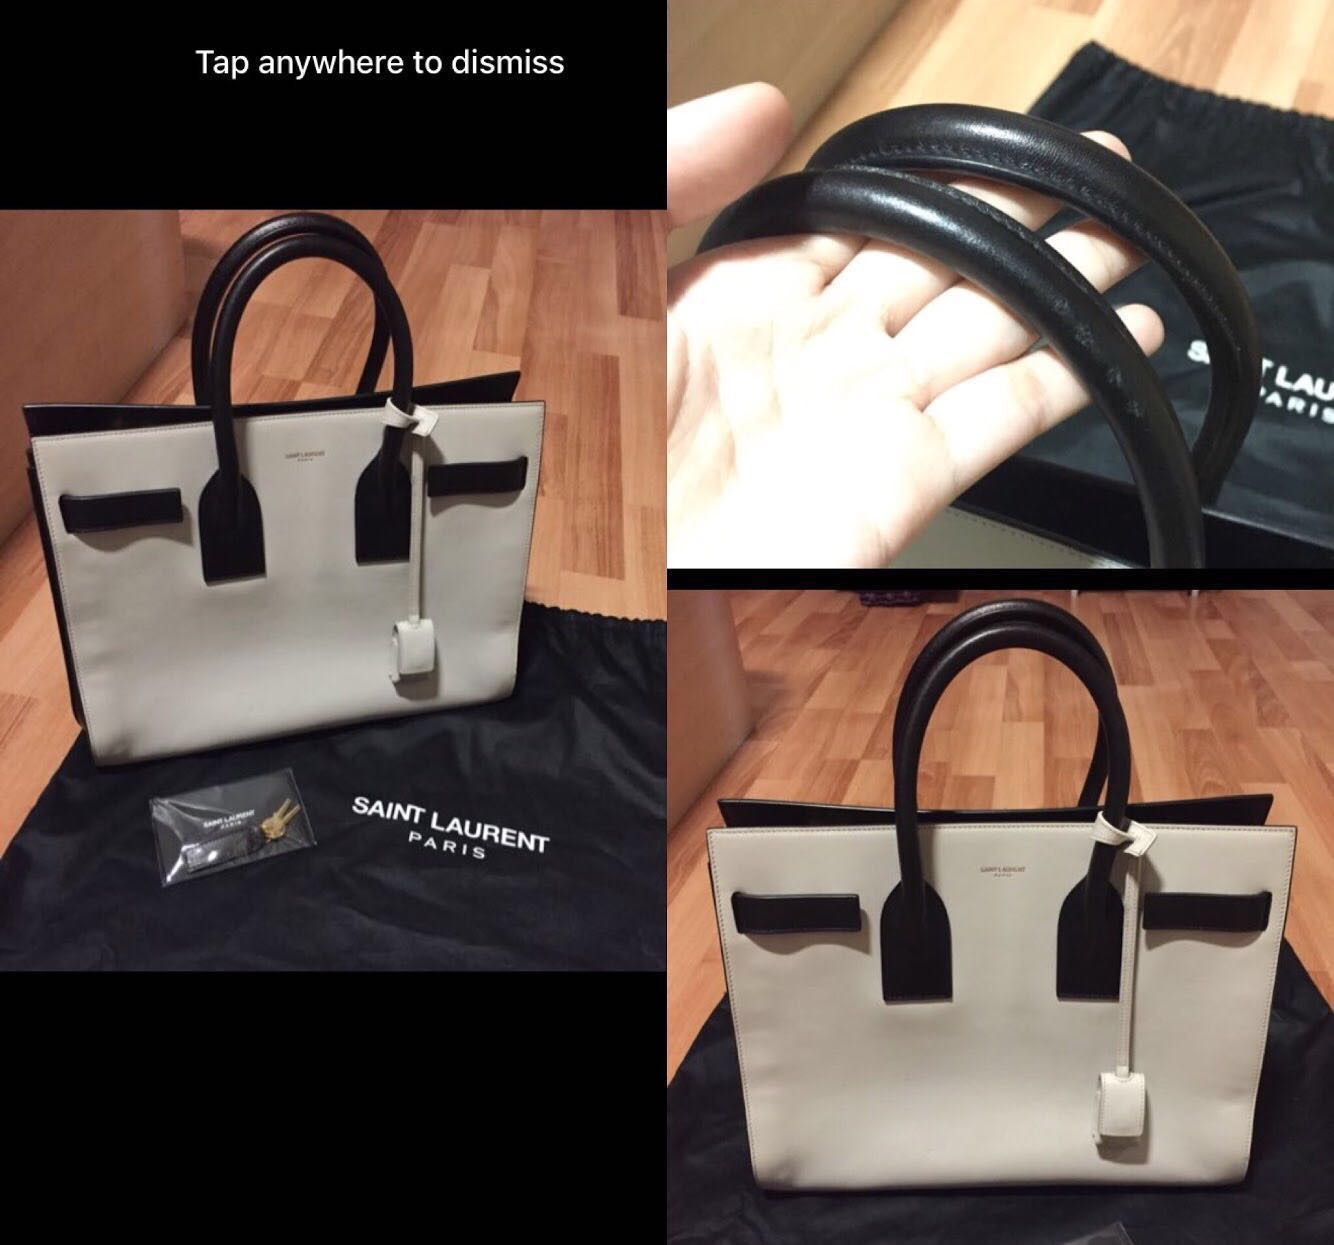 1078c66c4c0 Saint Laurent Sac De Jour, Luxury, Bags & Wallets, Handbags on Carousell